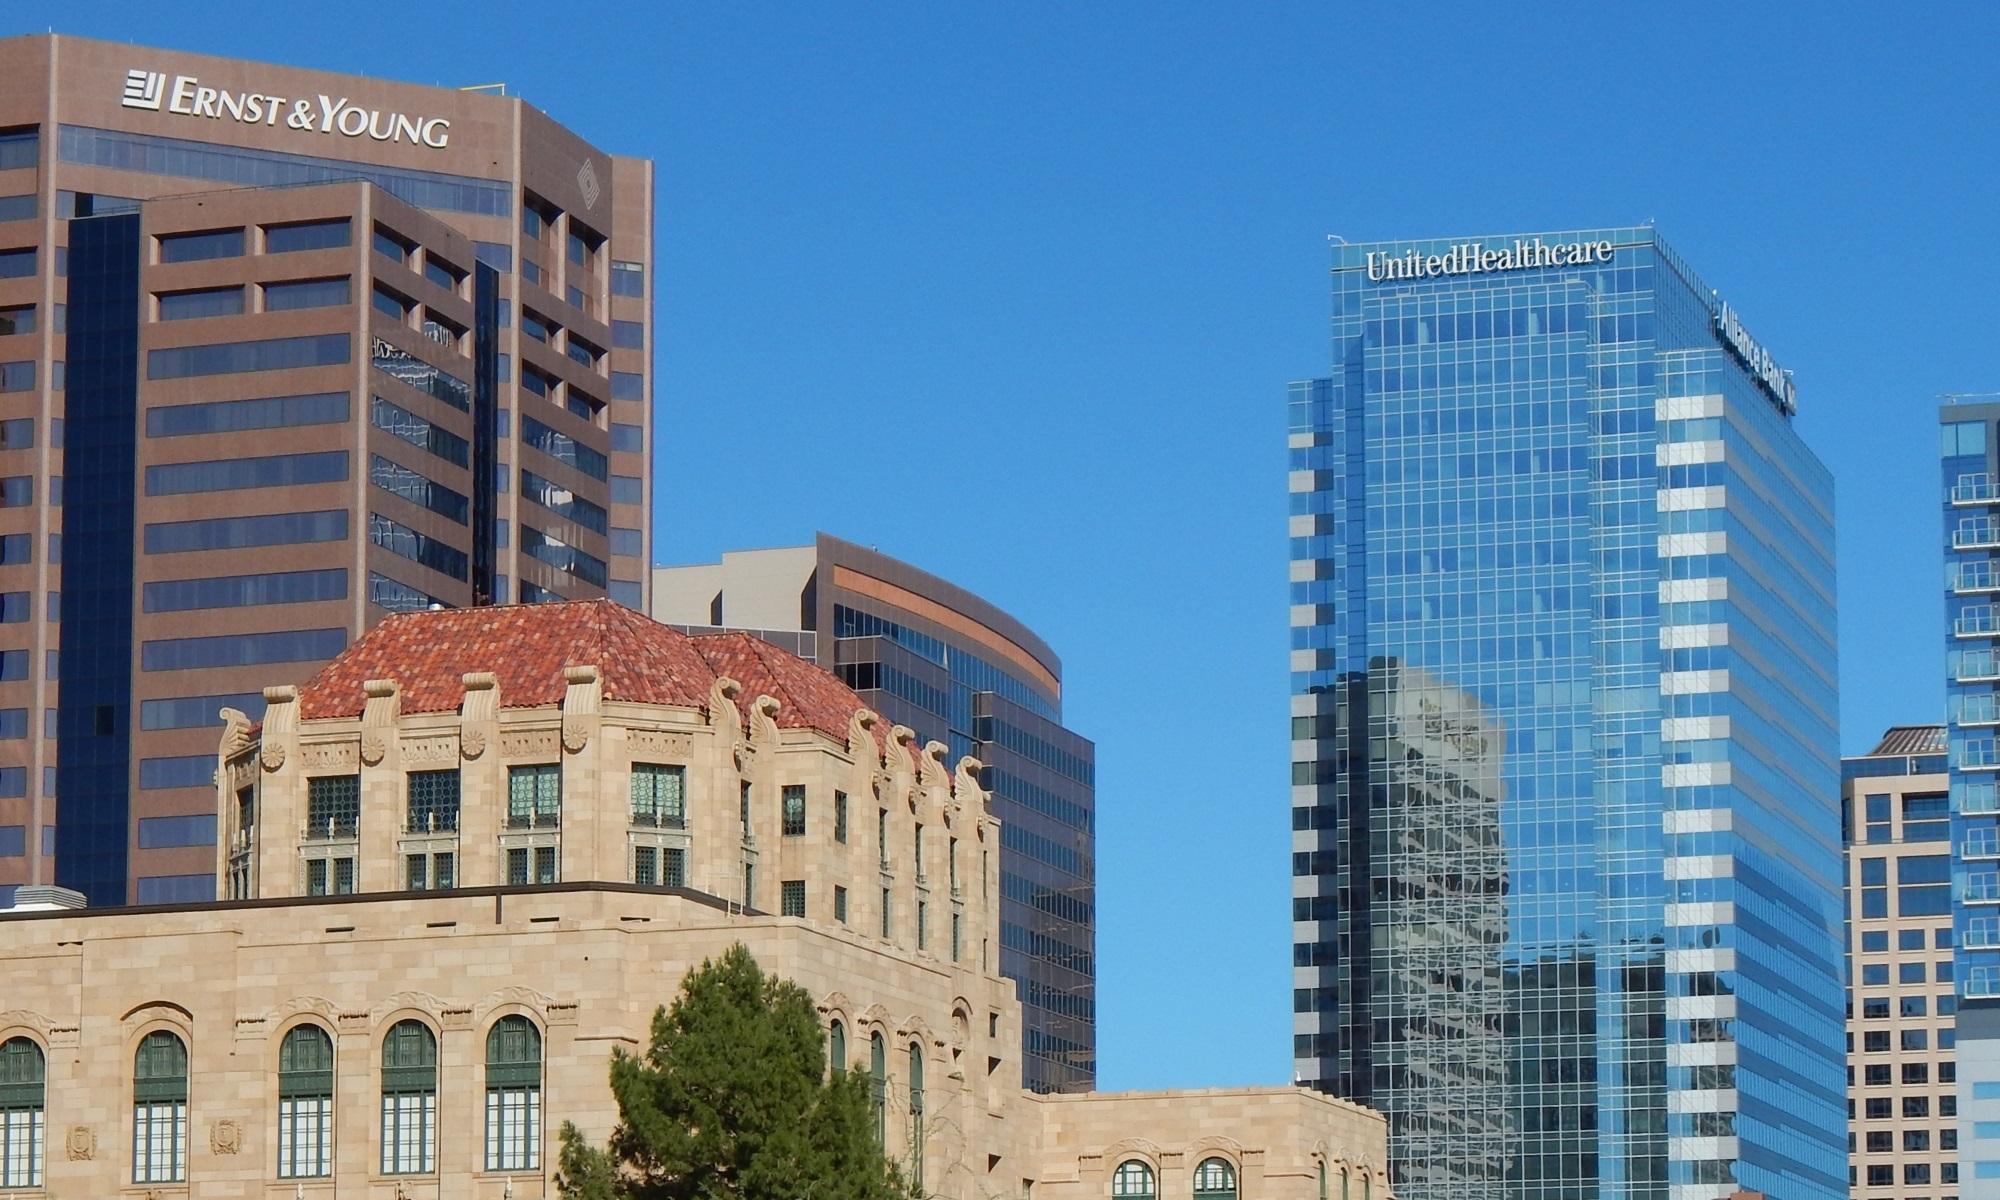 Image of Arizona State Capitol Building